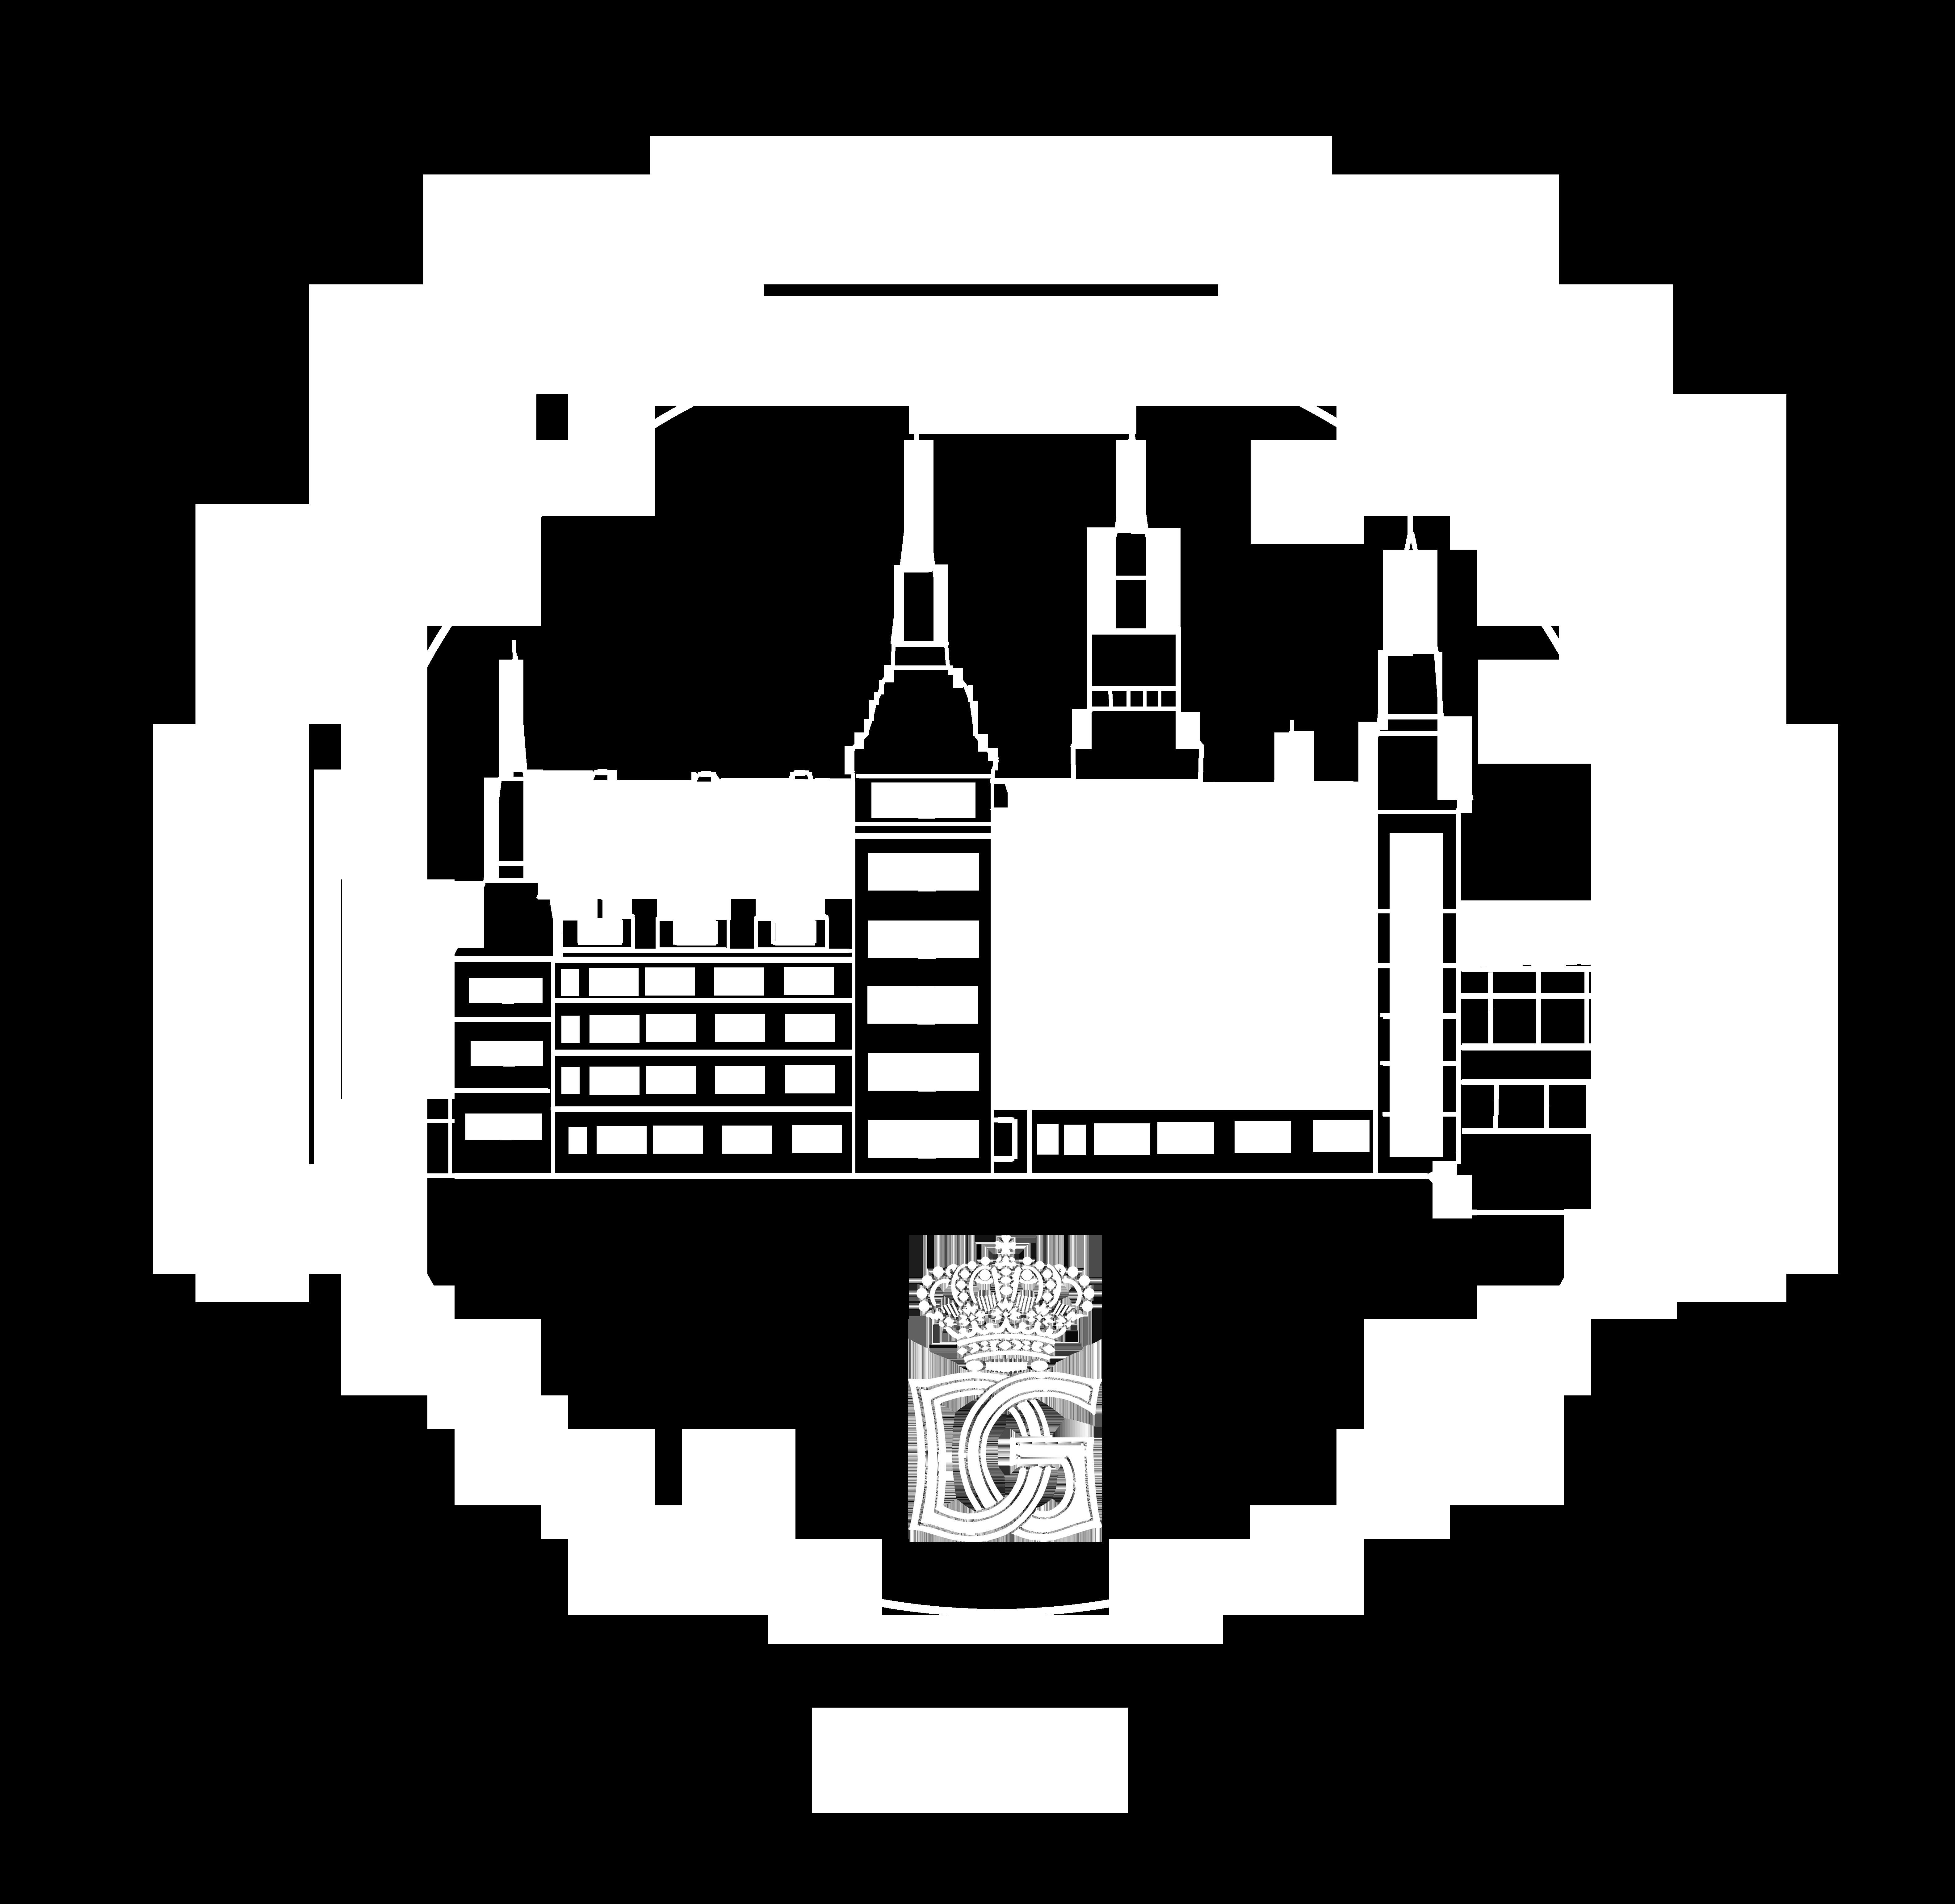 Frederiksborg Amts Garderforening